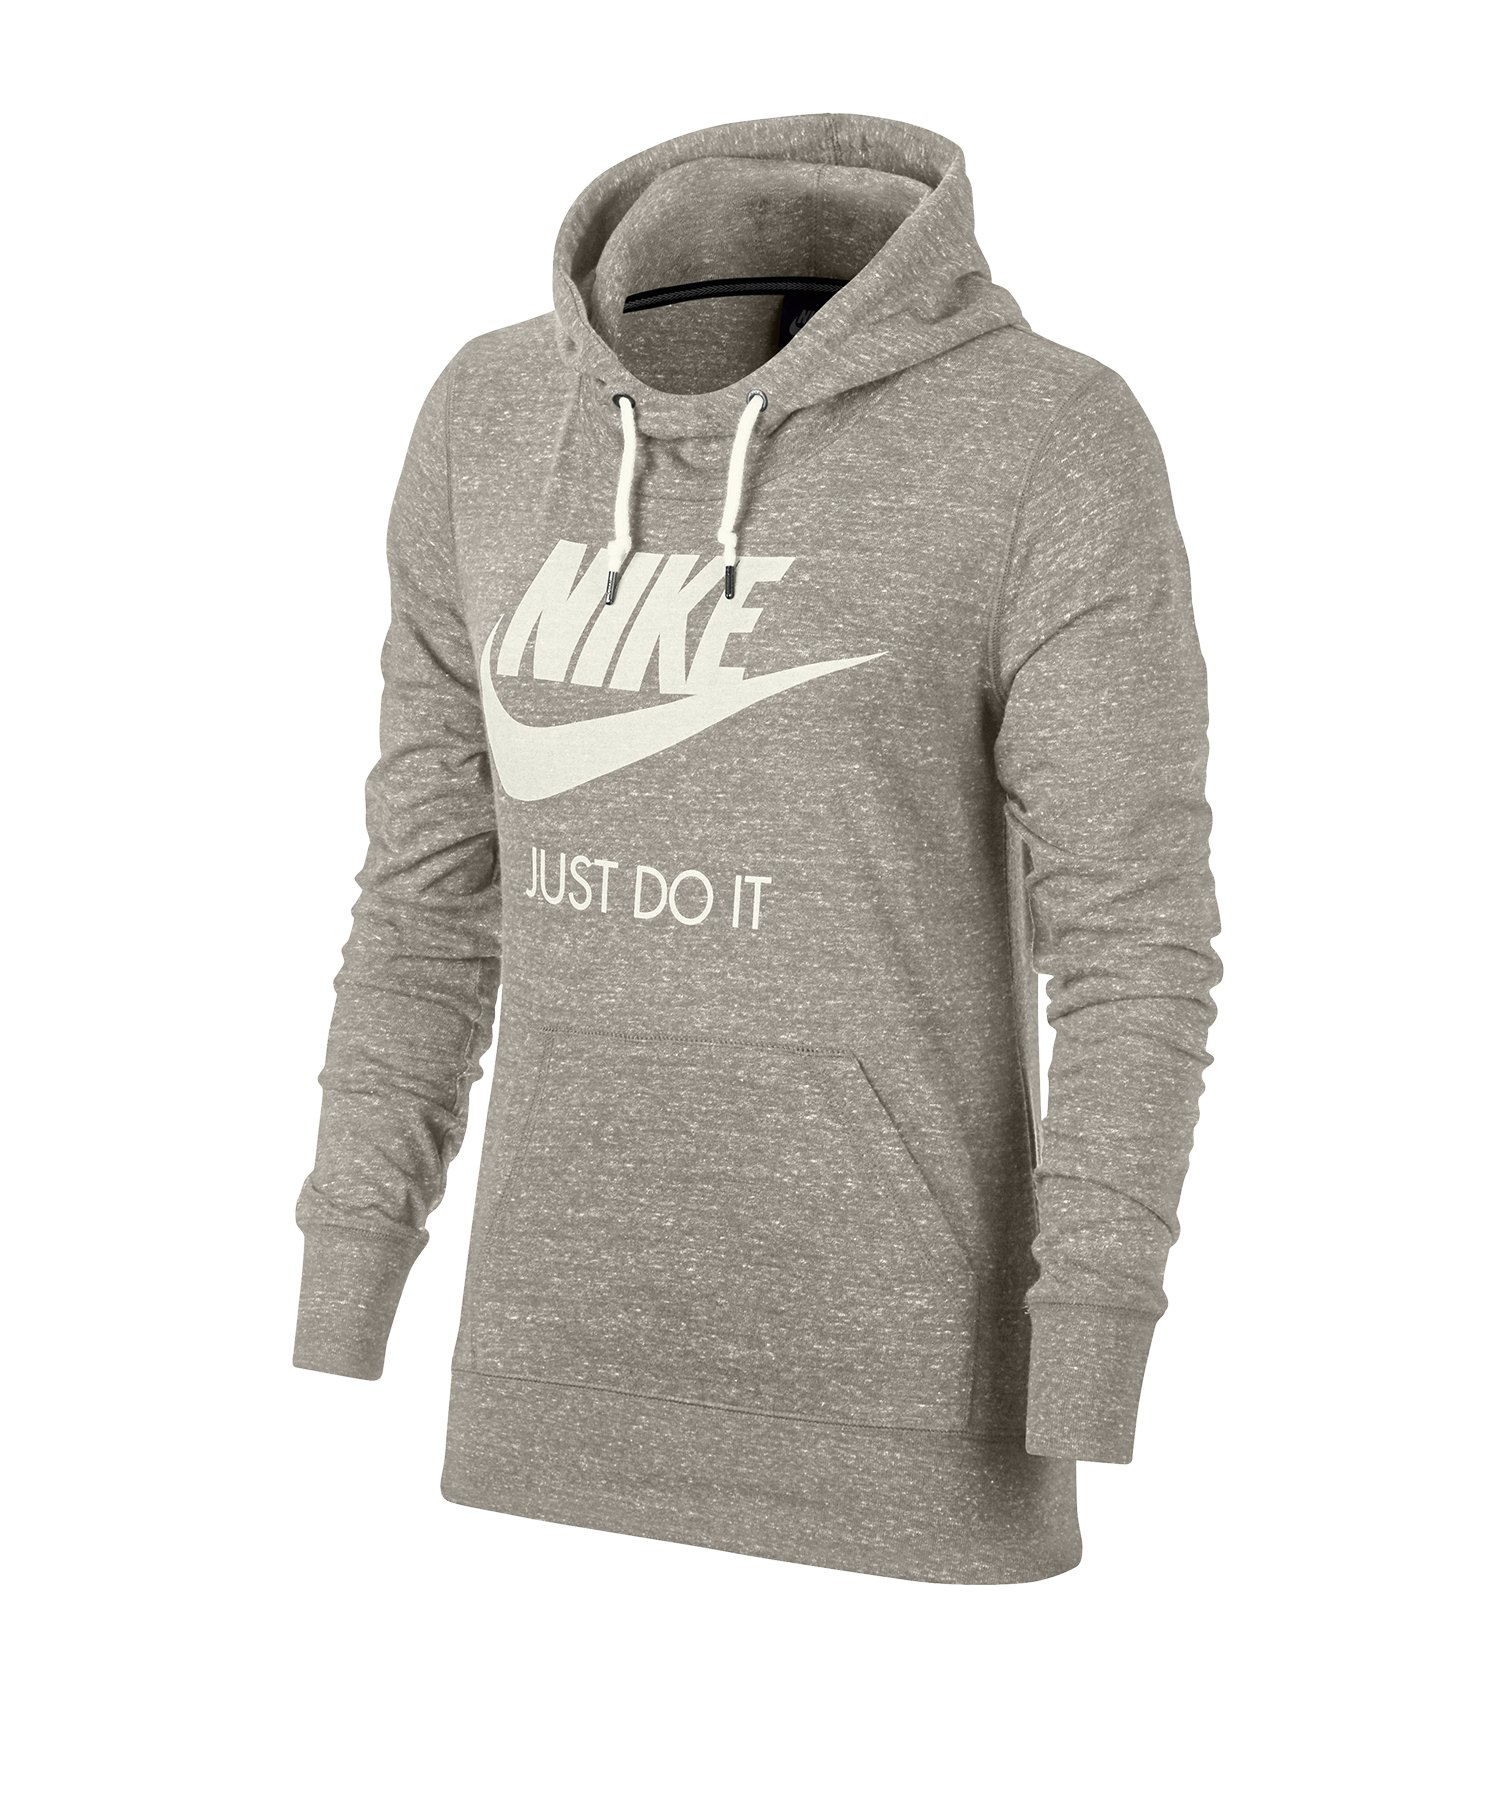 Nike Gym Vintage Kapuzensweatshirt Damen Grau F140 - beige